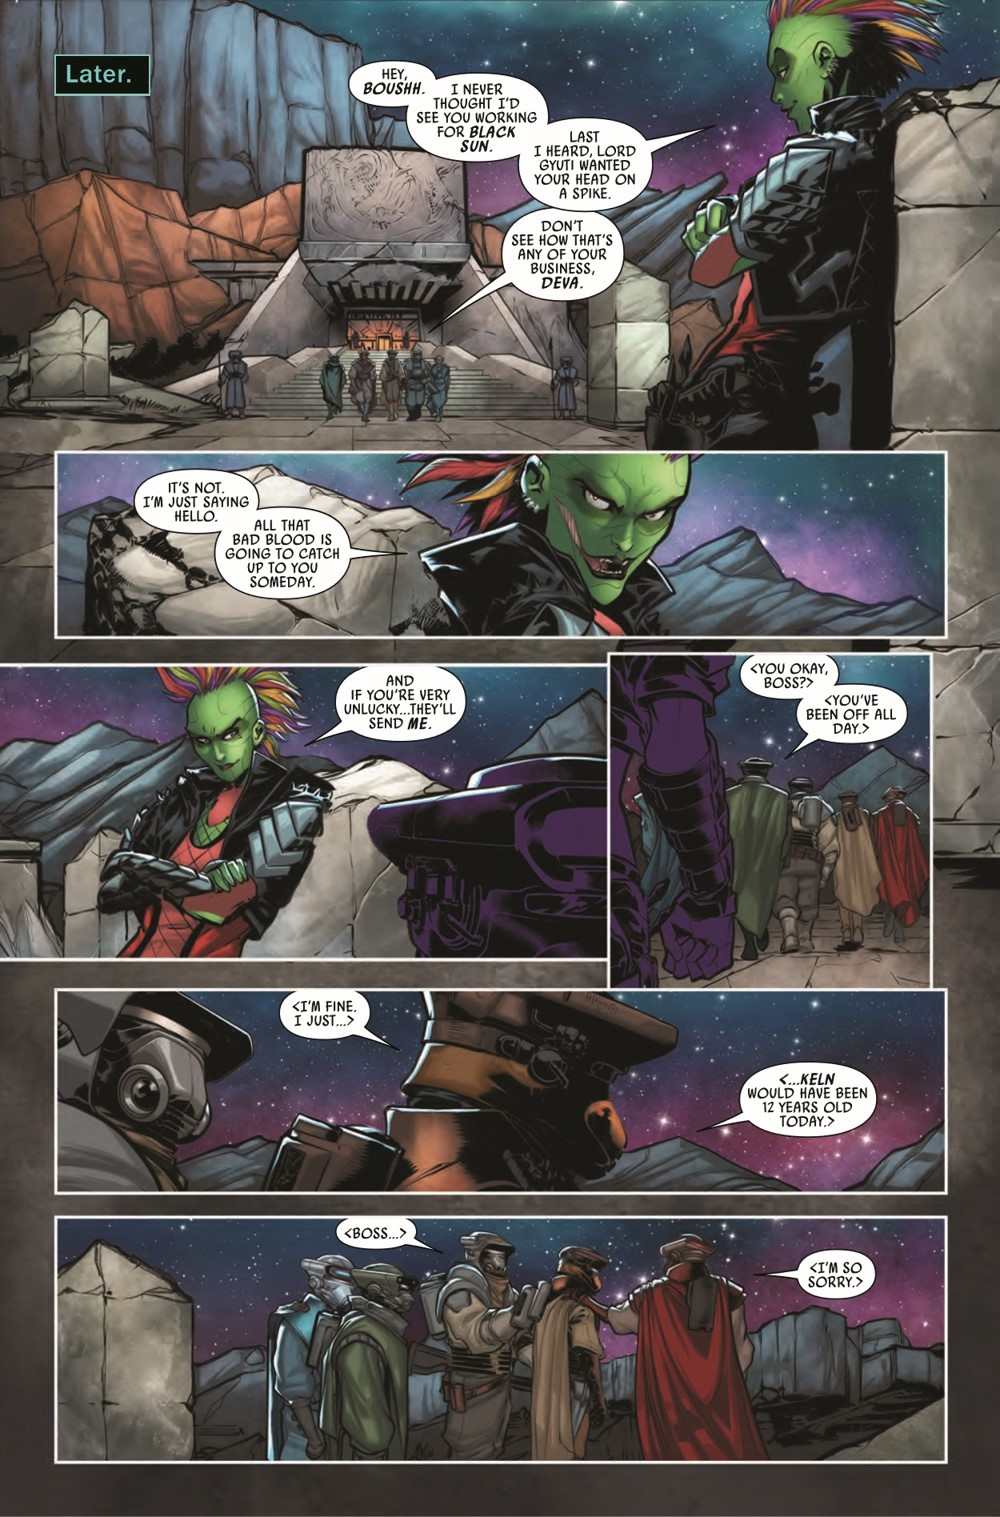 STWWAROTBHBOUSHH2021001_Preview-5 ComicList Previews: STAR WARS WAR OF THE BOUNTY HUNTERS BOUSHH #1